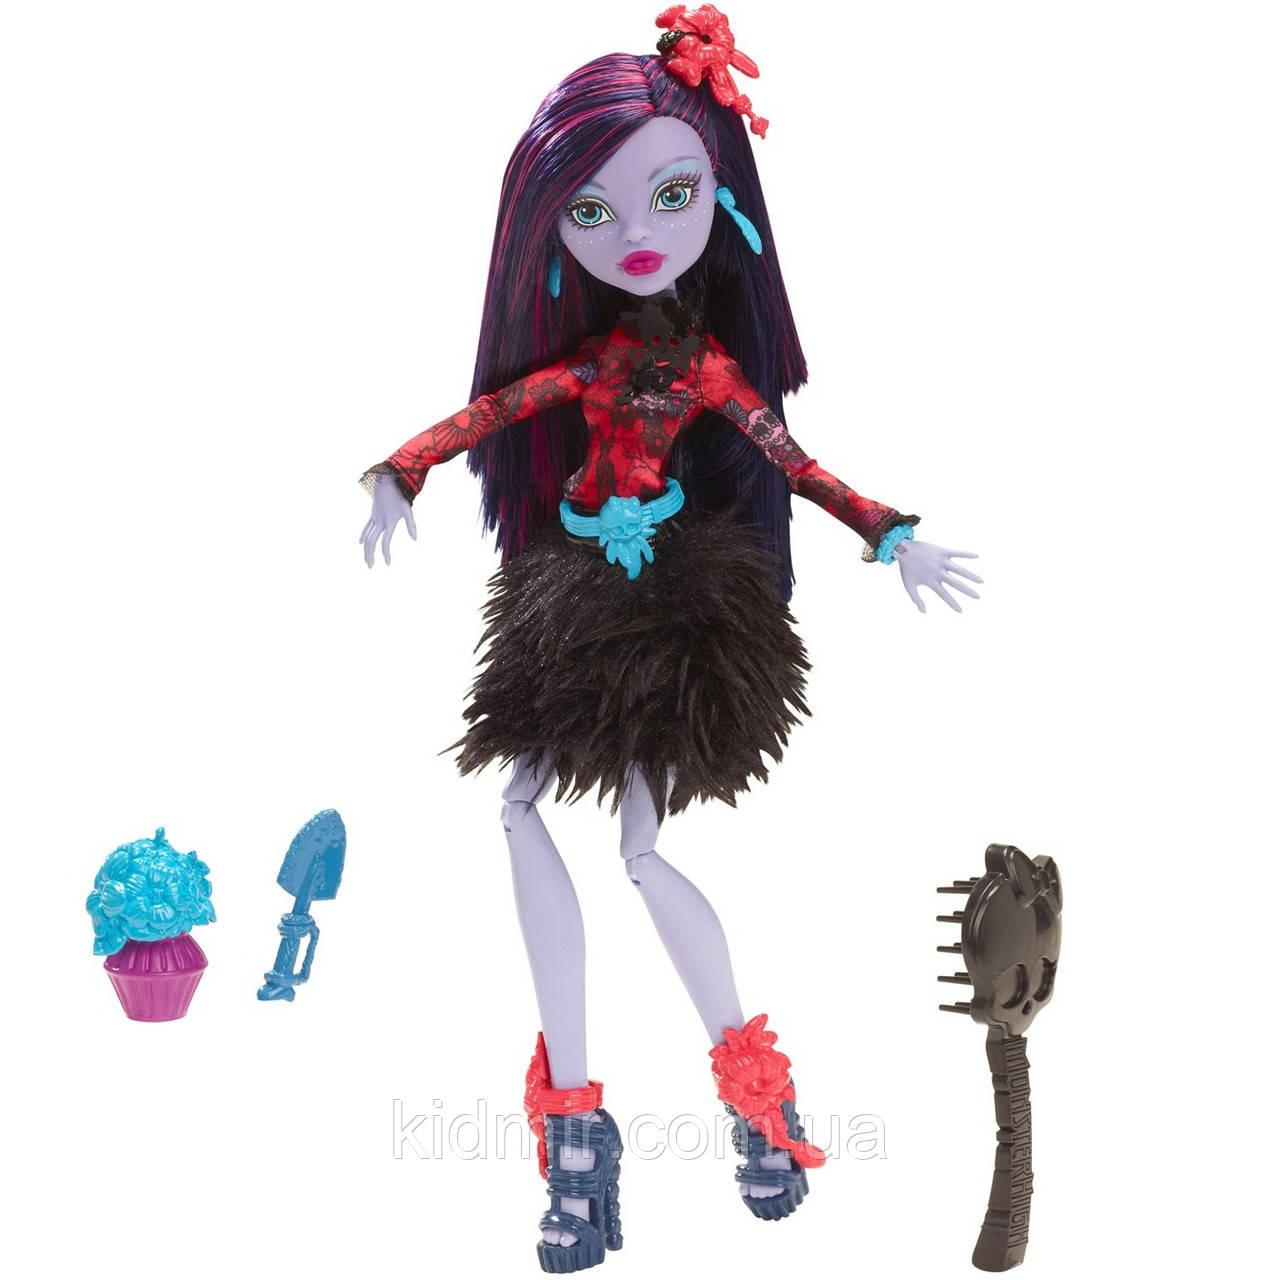 Кукла Monster High Джейн Булитл (Jane Boolittle) из серии Gloom and Bloom Монстр Хай